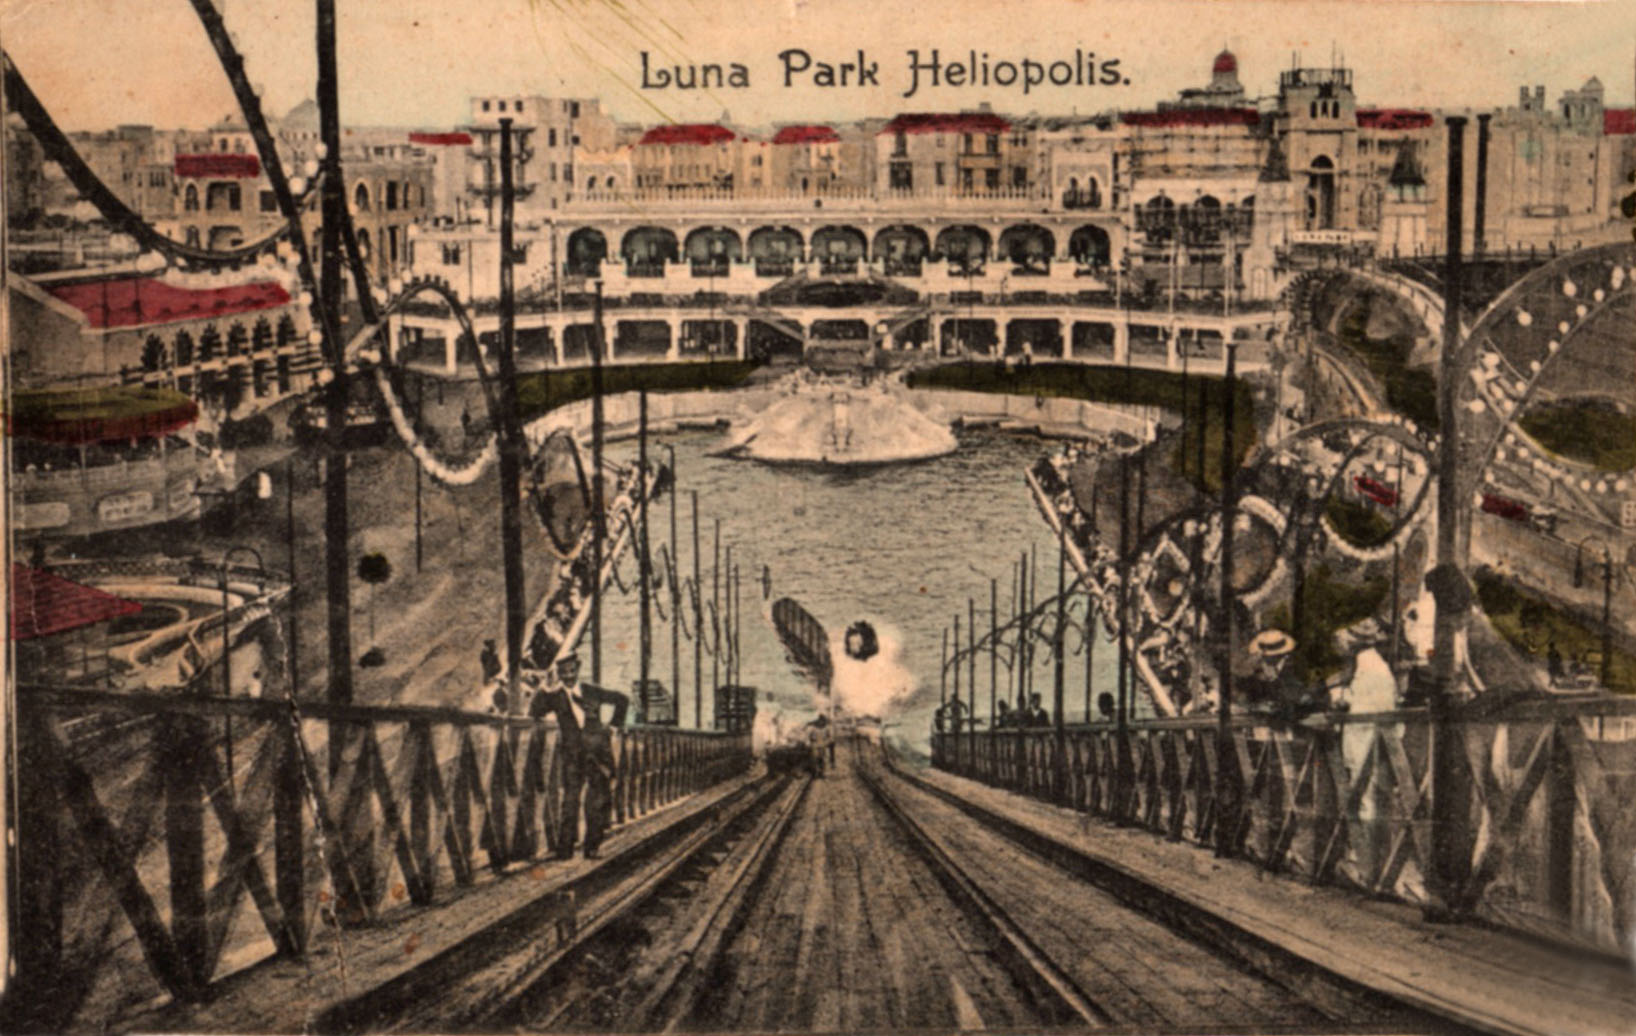 Luna Park and Australian Troops in Heliopolis